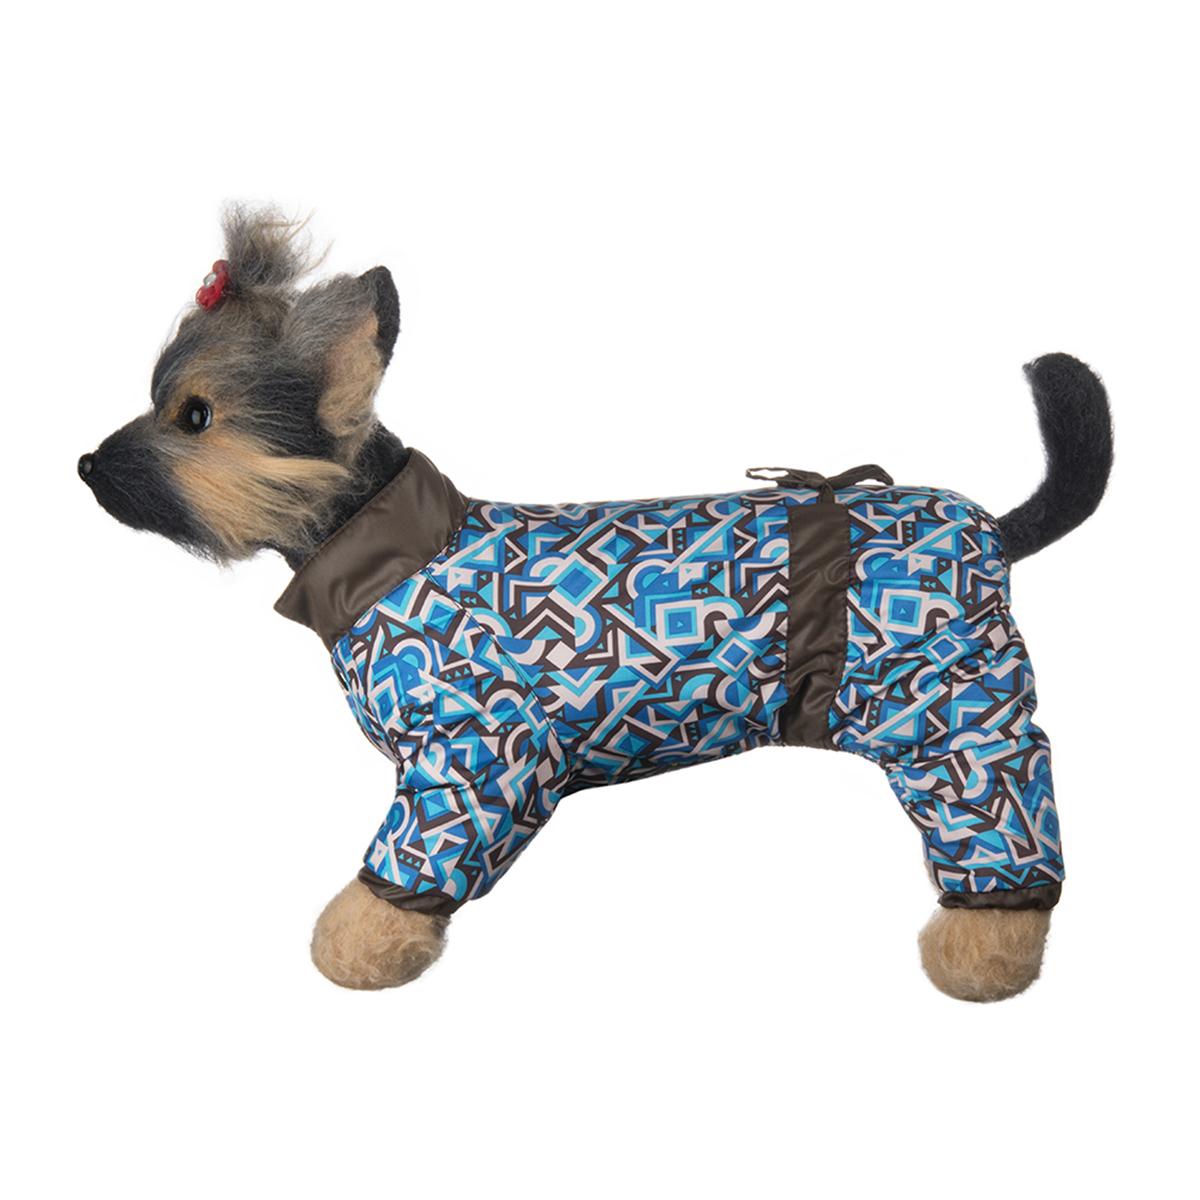 "Комбинезон для собак Dogmoda ""Норд"", зимний, унисекс, цвет: коричневый, бежевый, голубой. Размер 2 (M)"